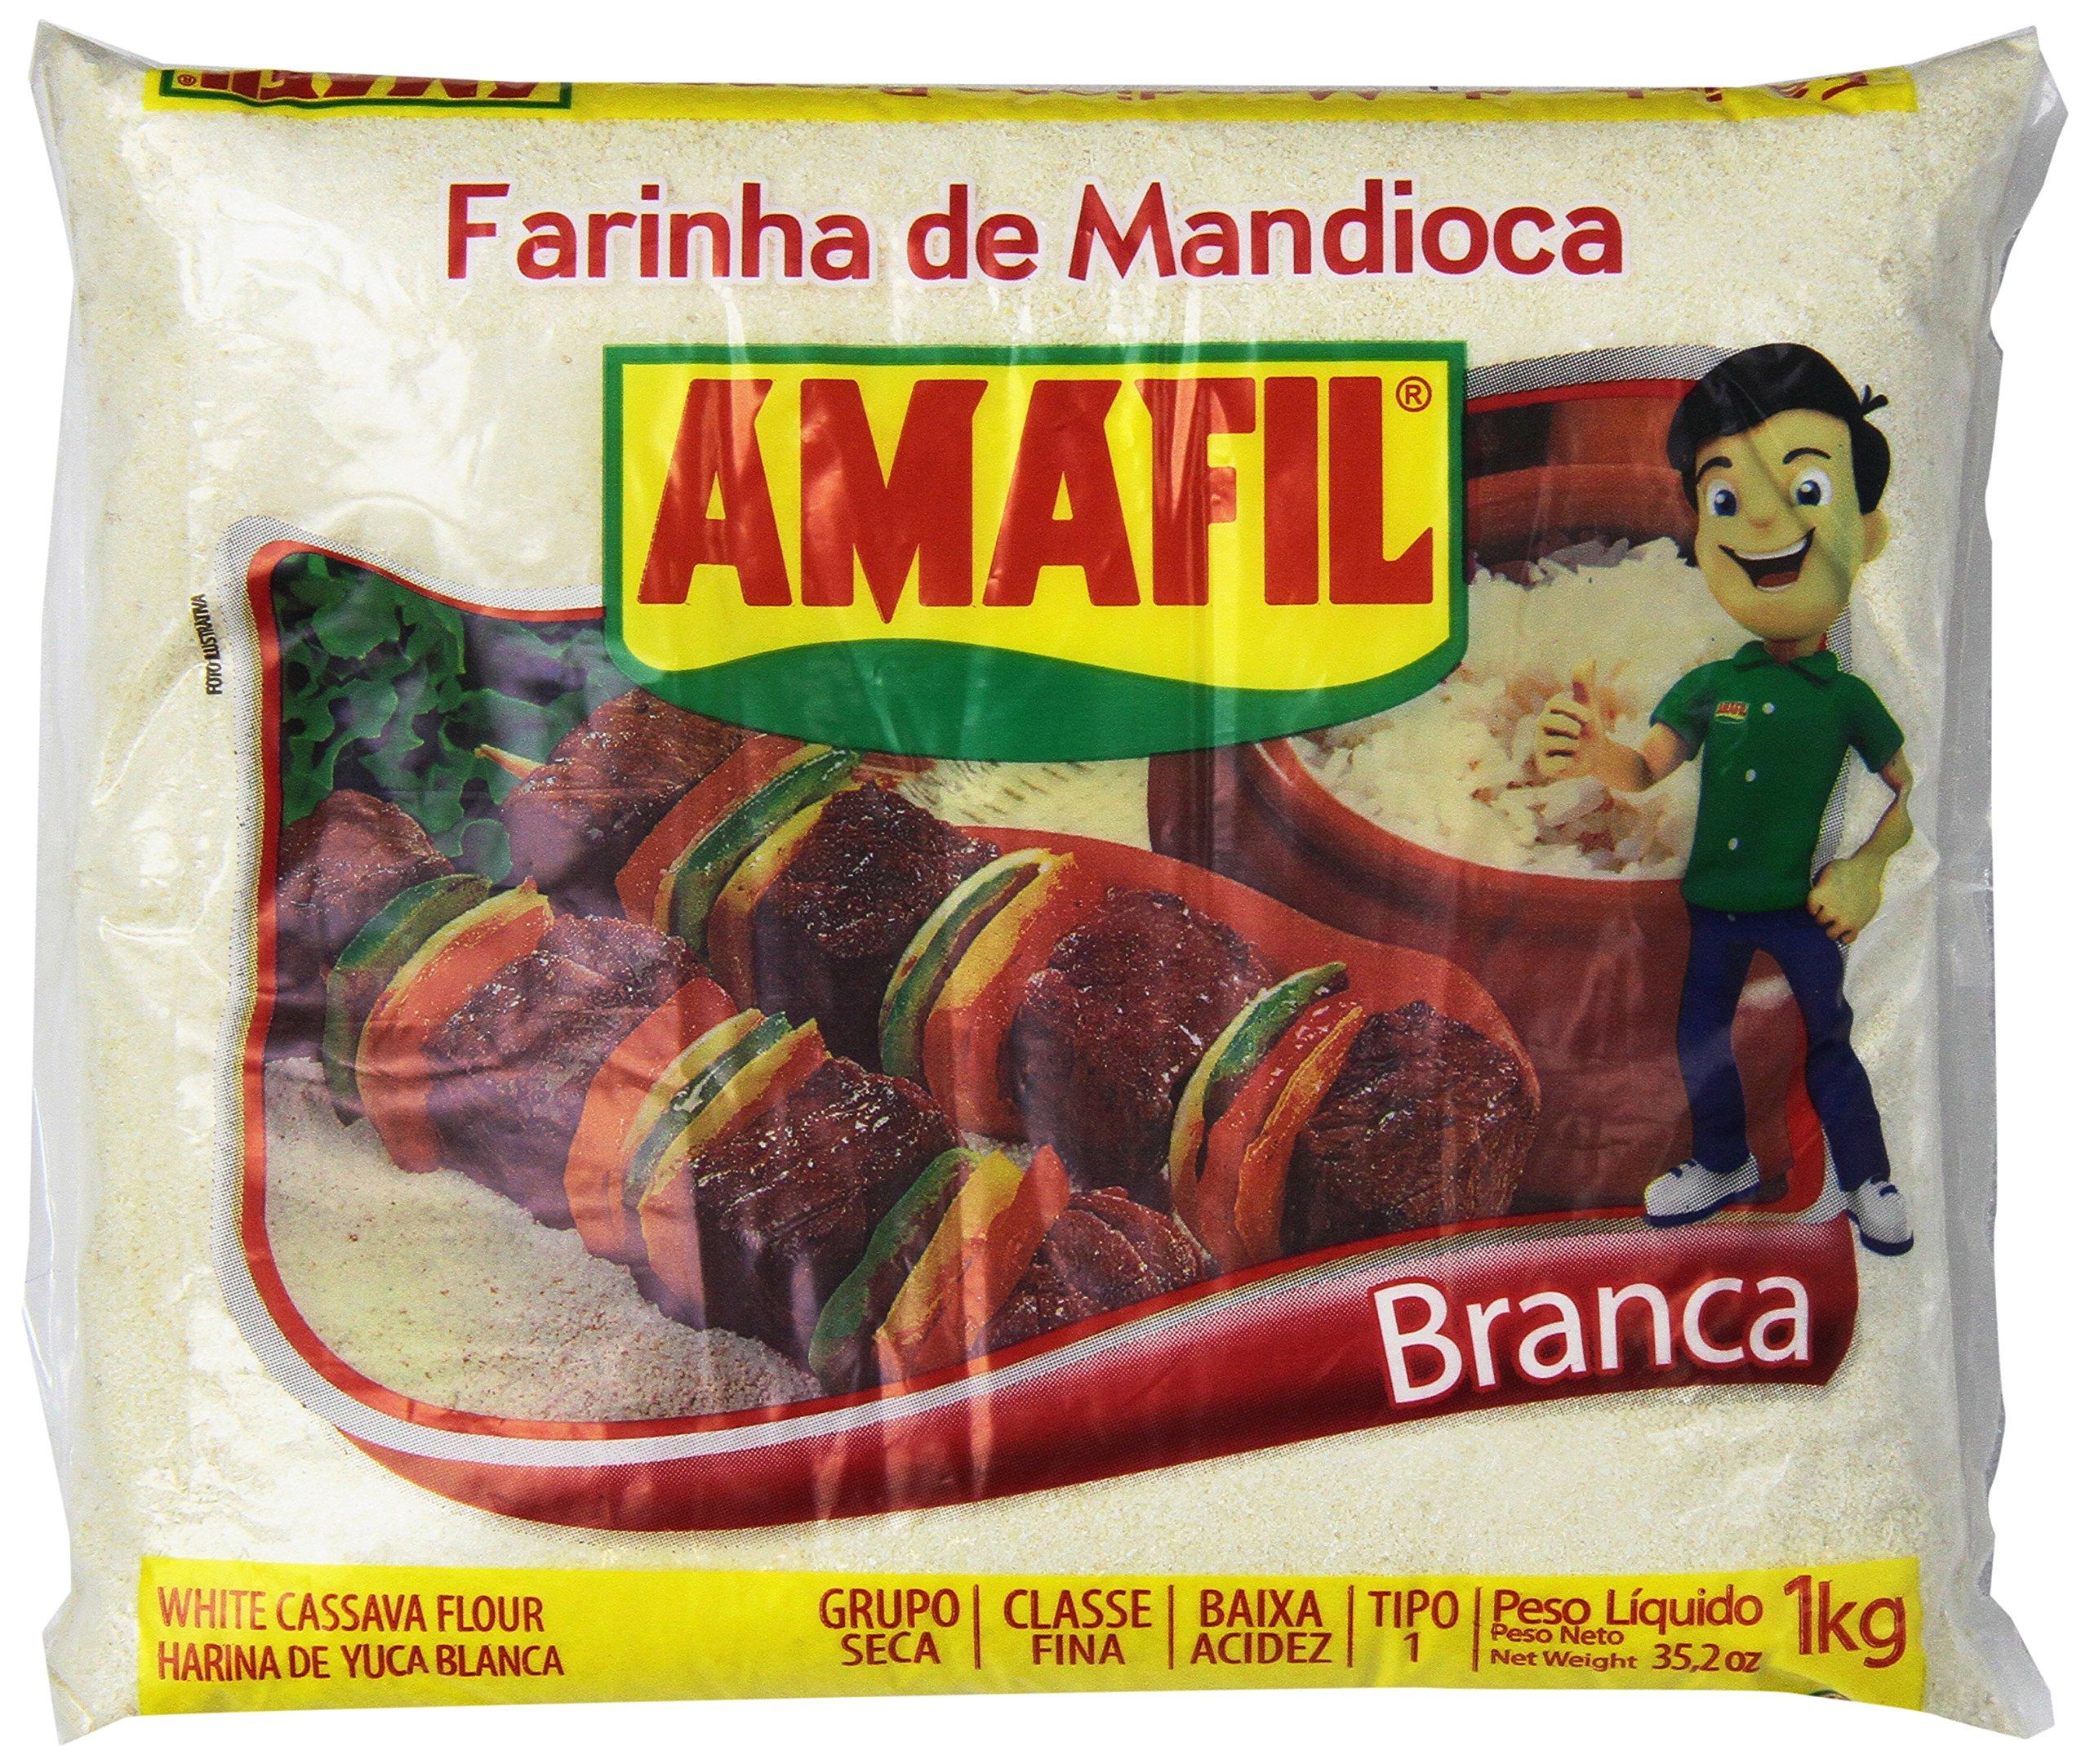 Amafil - Farinha de Mandioca Branca | White Cassava Flour - Harina De Yuca Blanca |